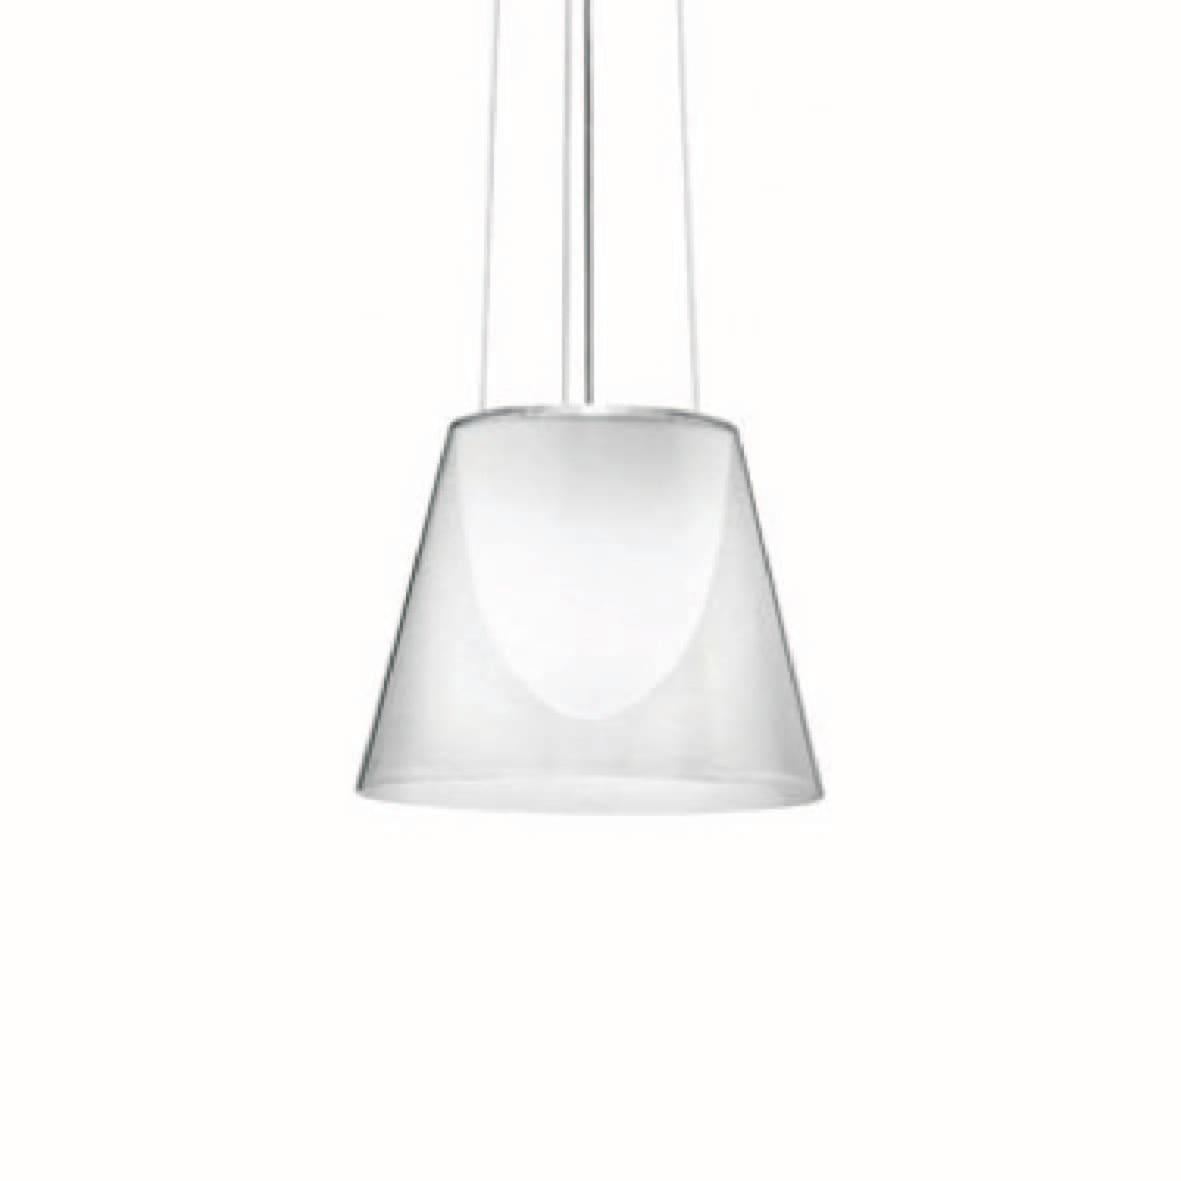 Transparente - +139,18US$